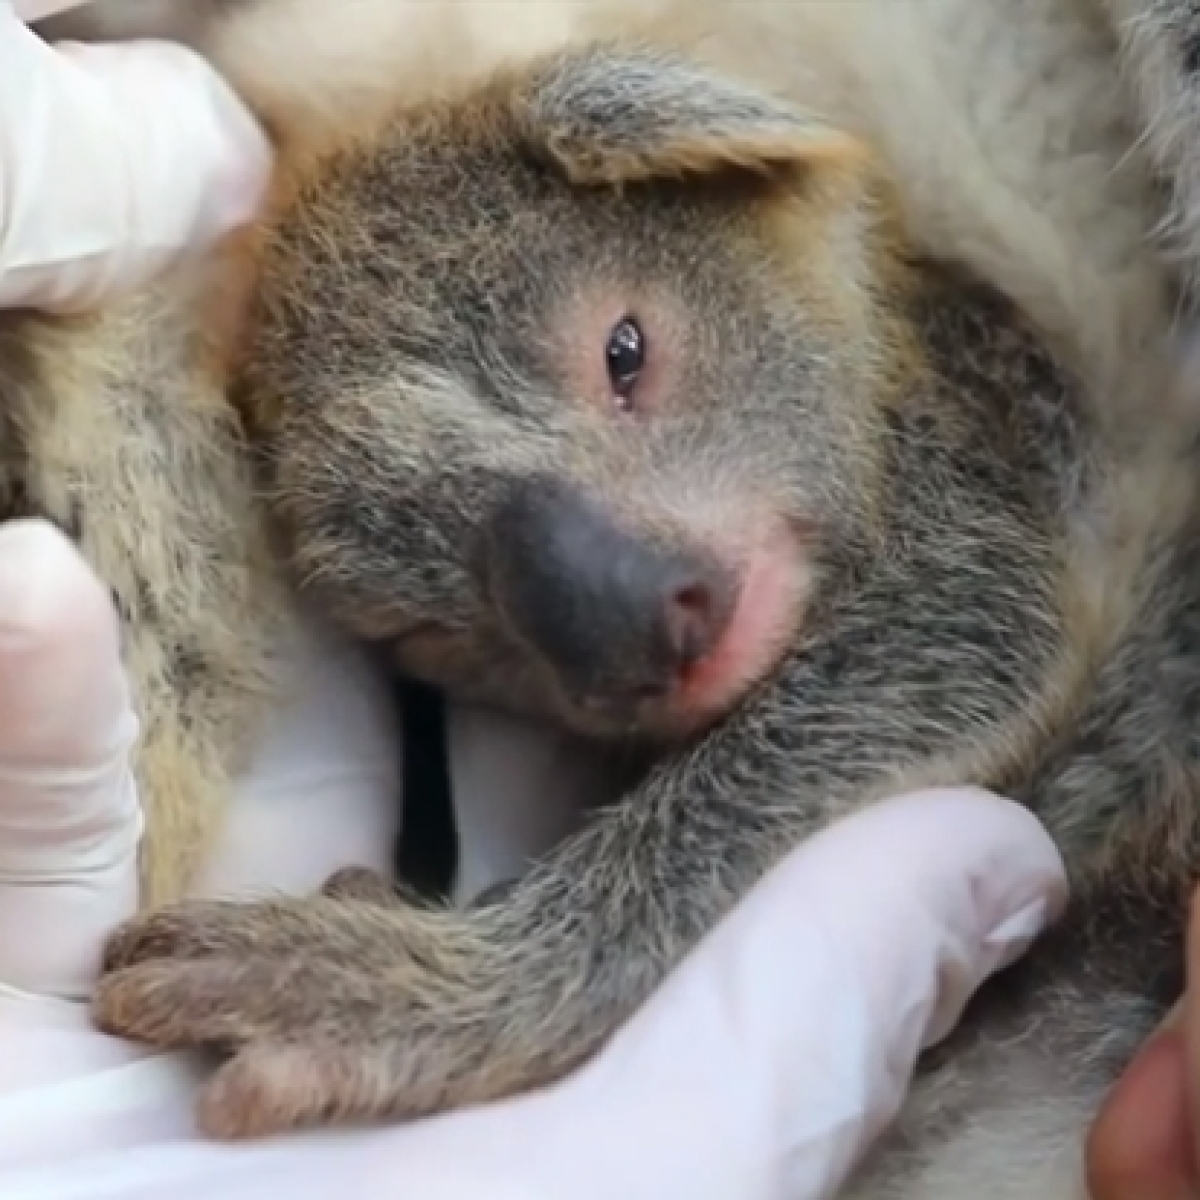 First koala born since Australia's devastating bushfires; handlers name it 'Ash'